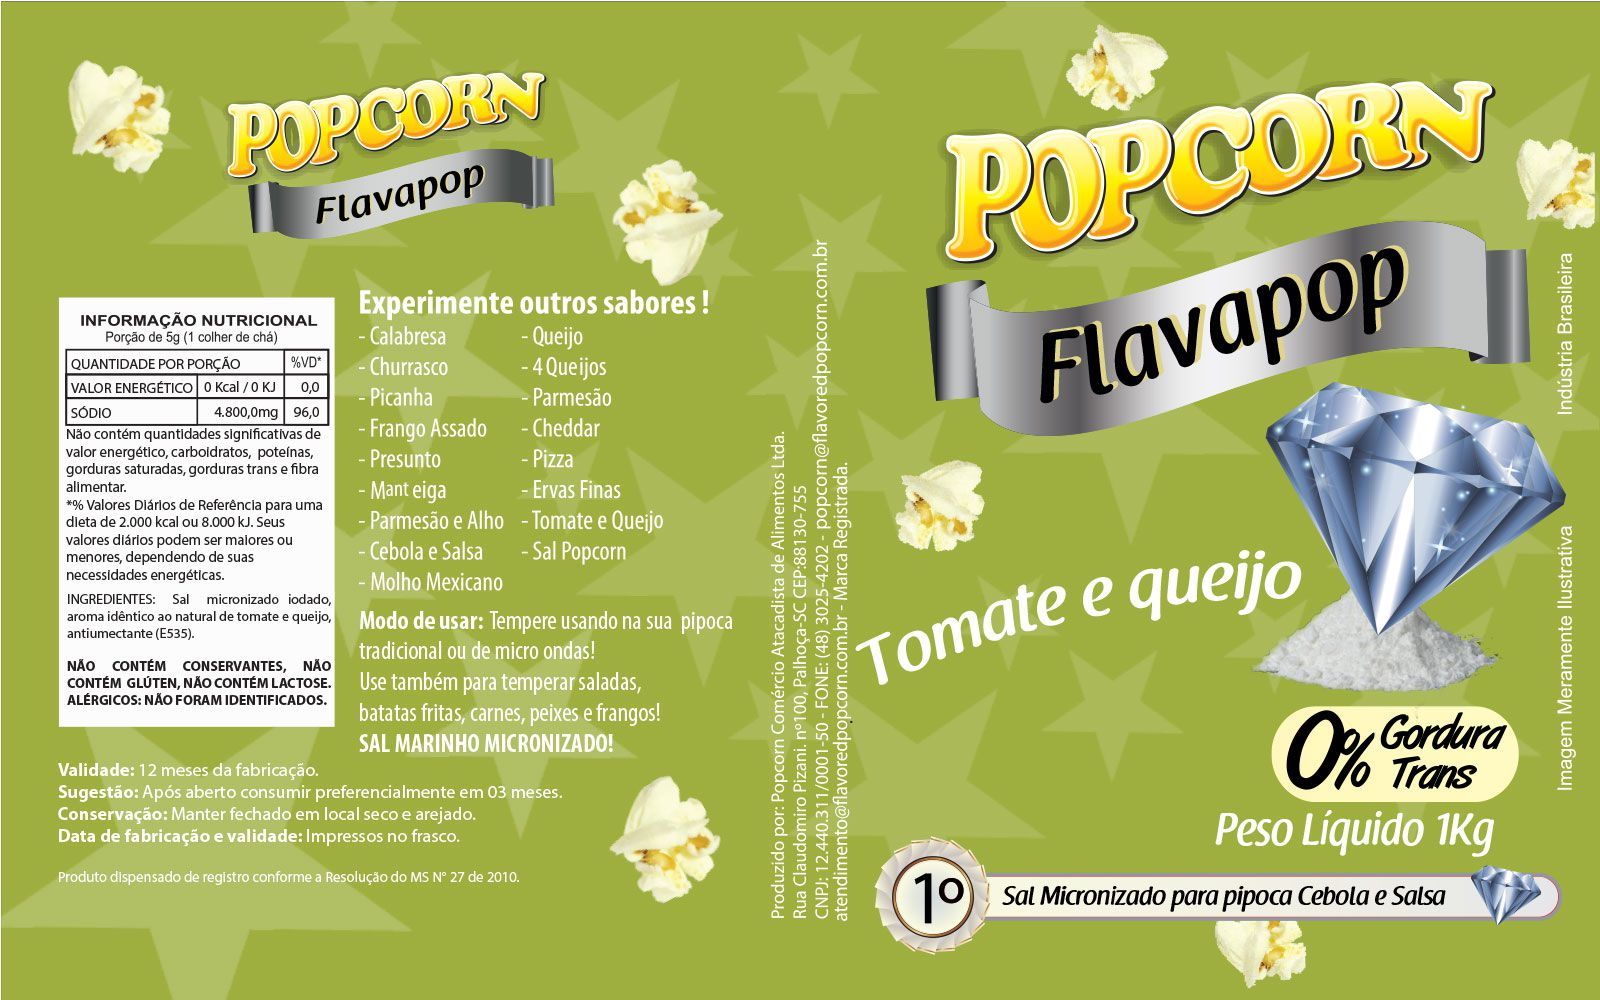 FLAVAPOP - Original de cinema -  Tomate e Queijo - Micronizado Popcorn  - Pct 1kg